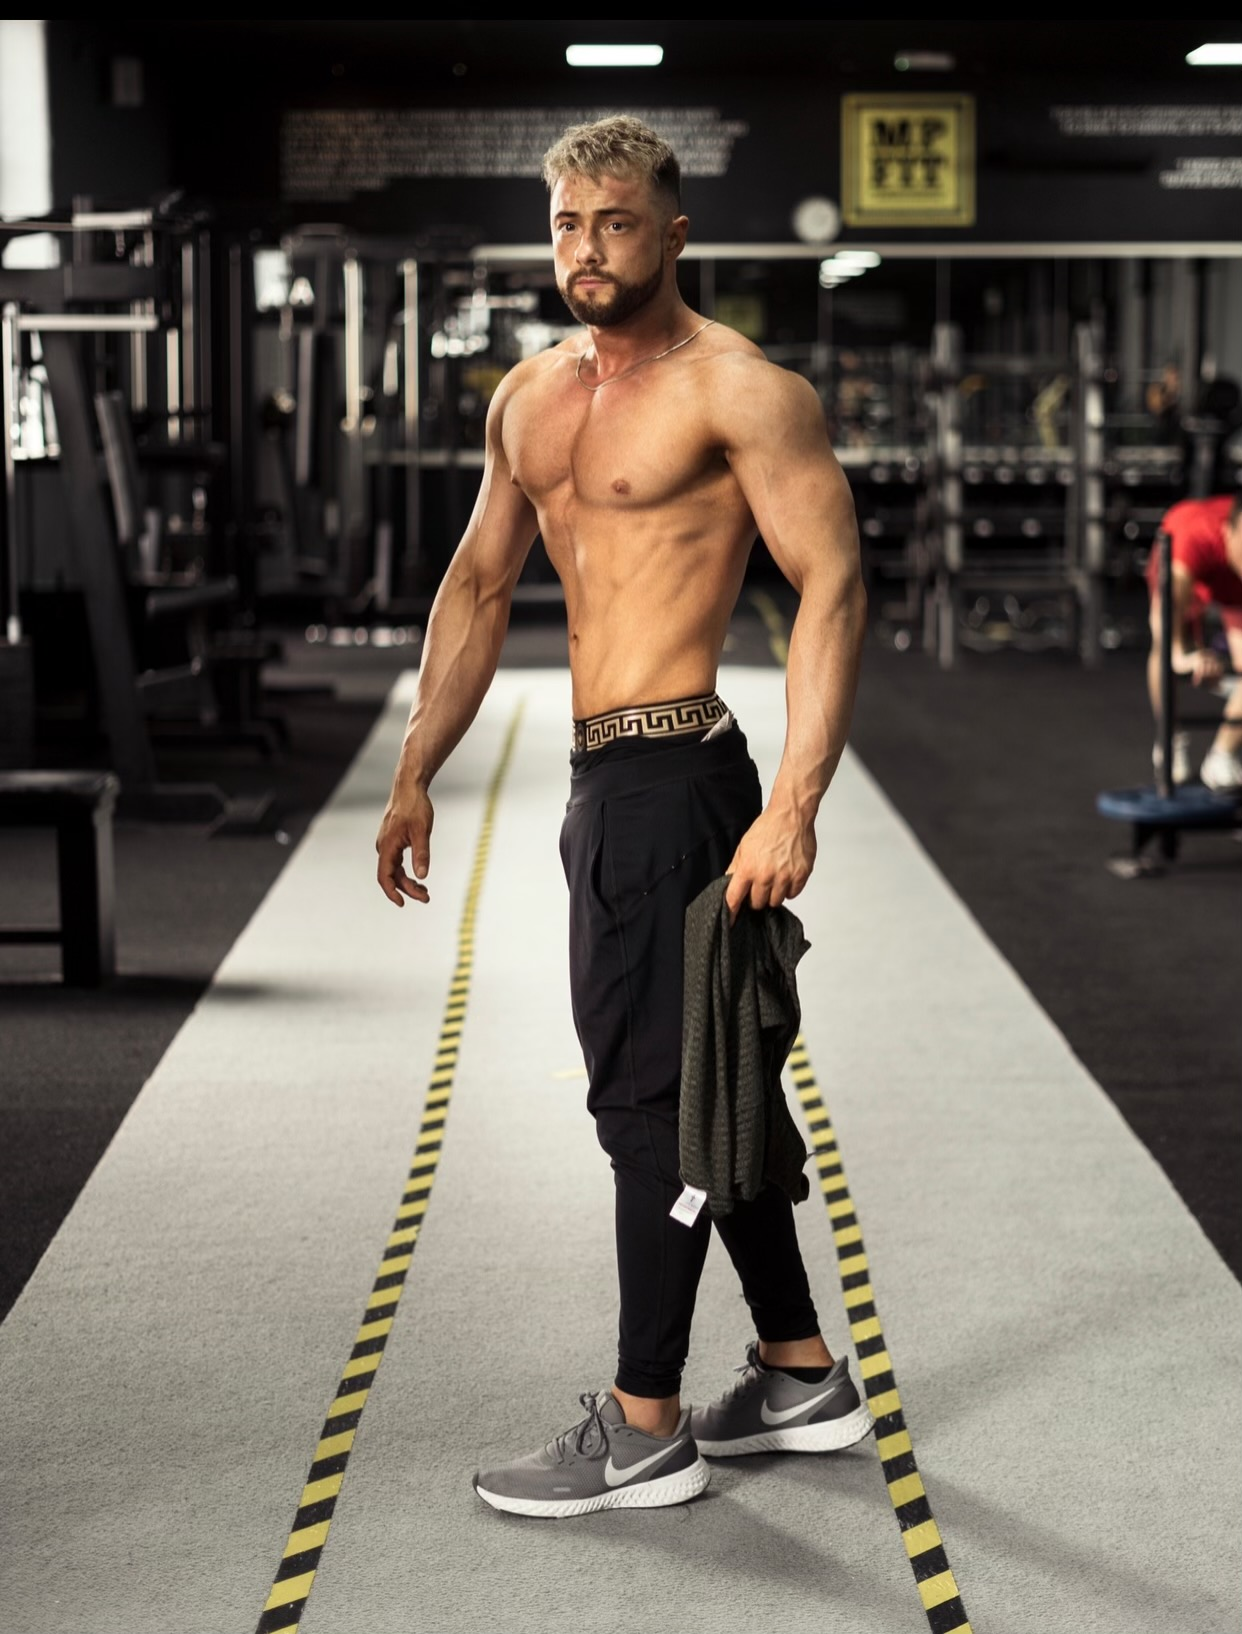 Matt Hall Bodybuilding